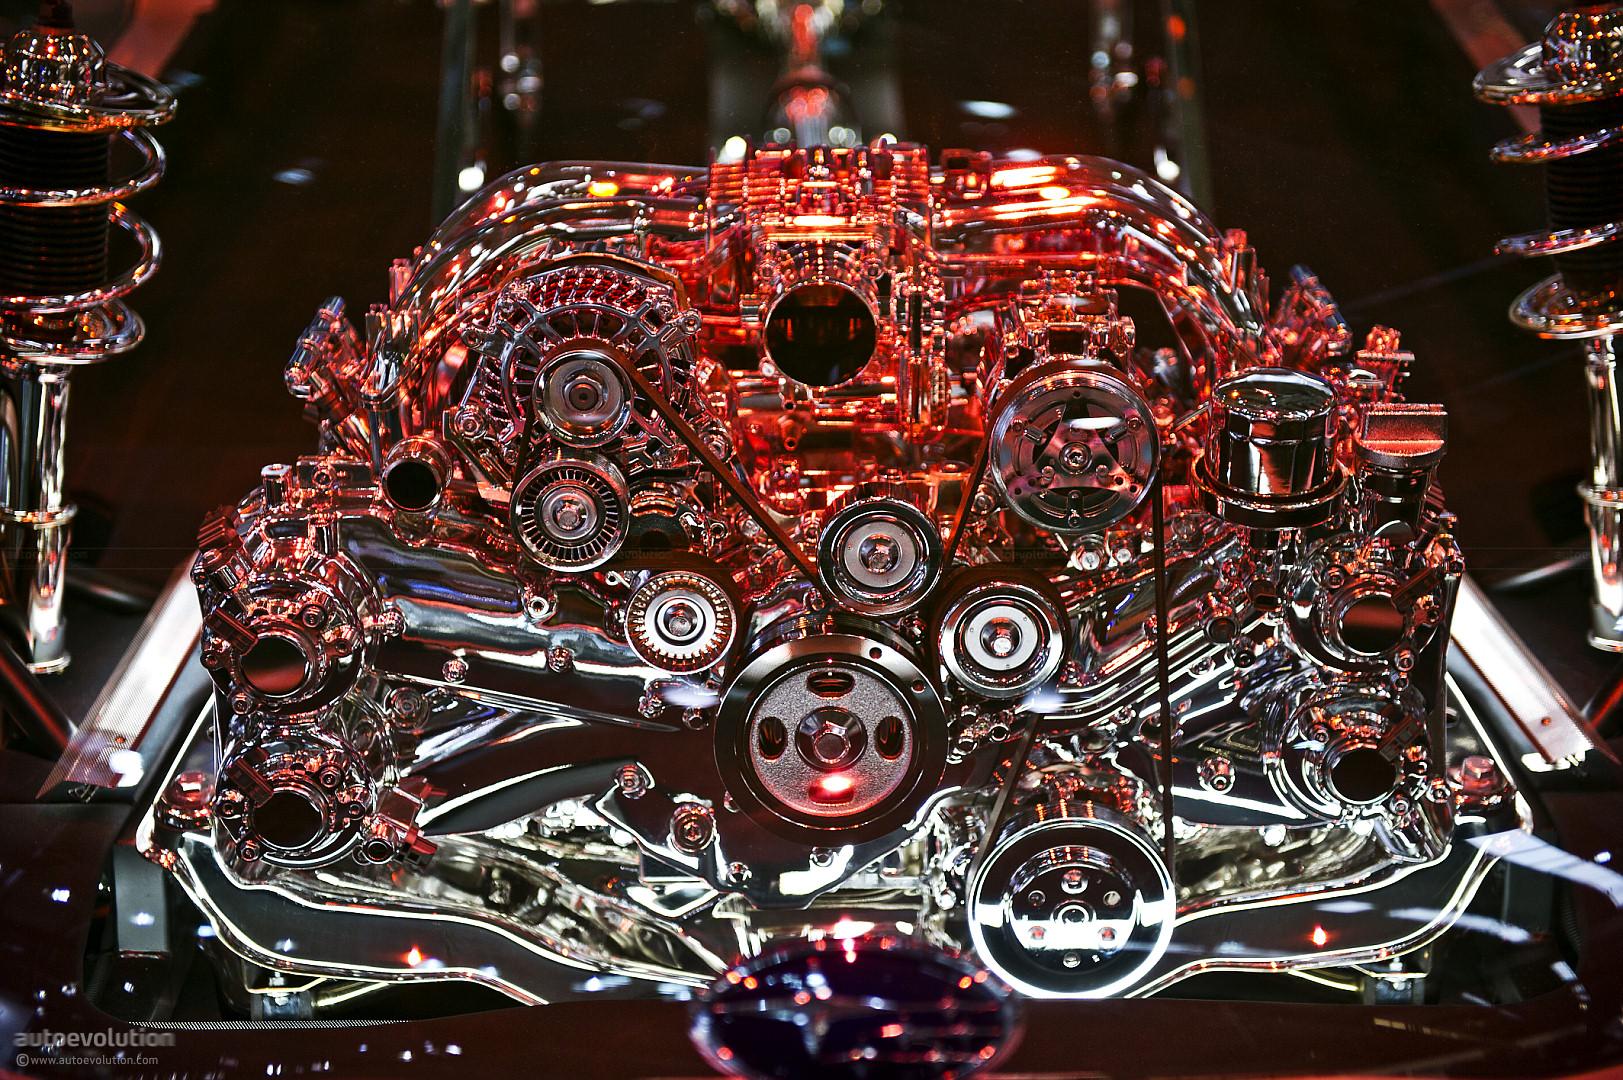 New Subaru Turbo Engines Coming in 2012 - autoevolution